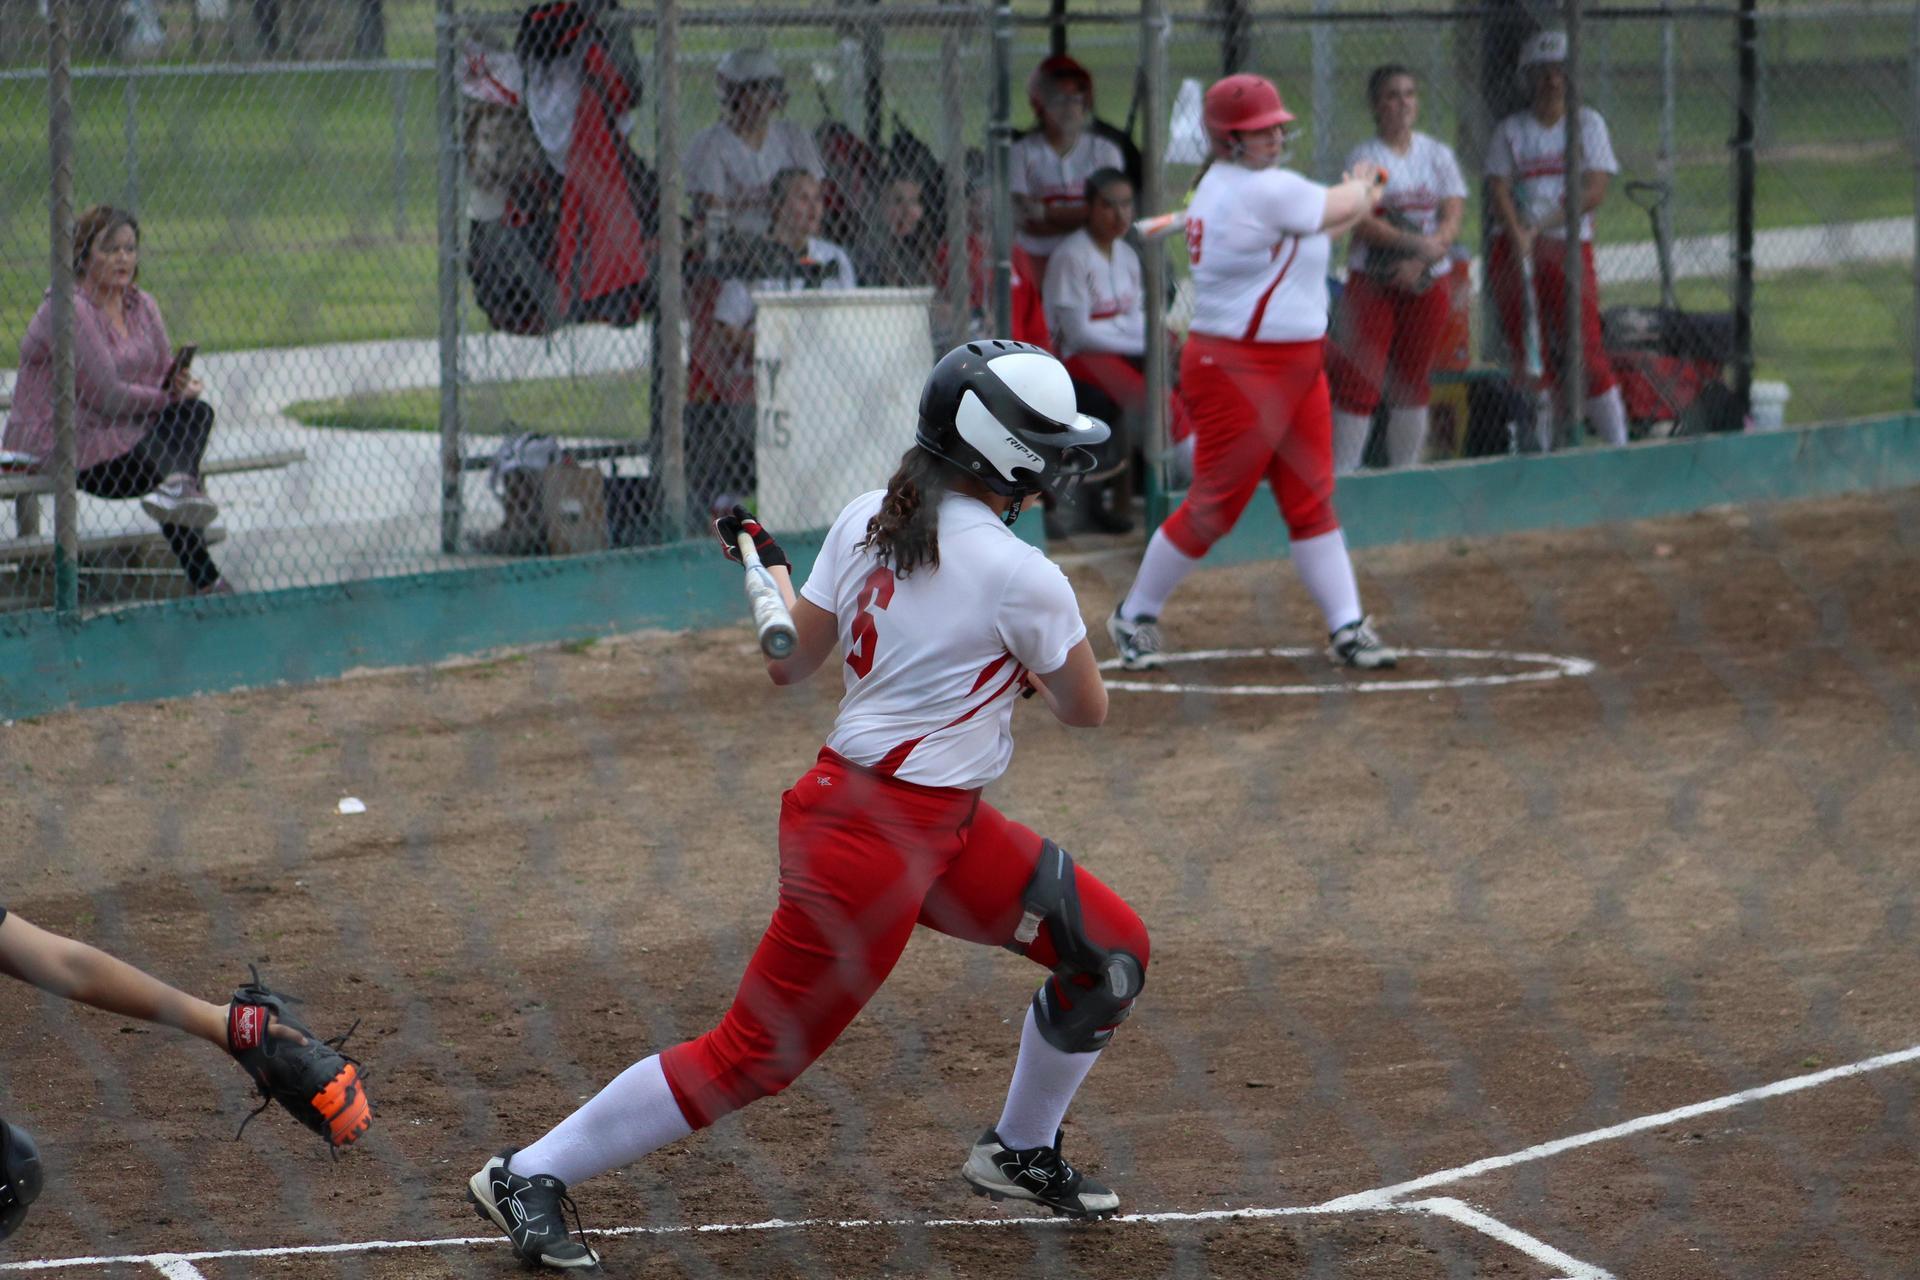 JV Girls playing softball against Sierra Pacific